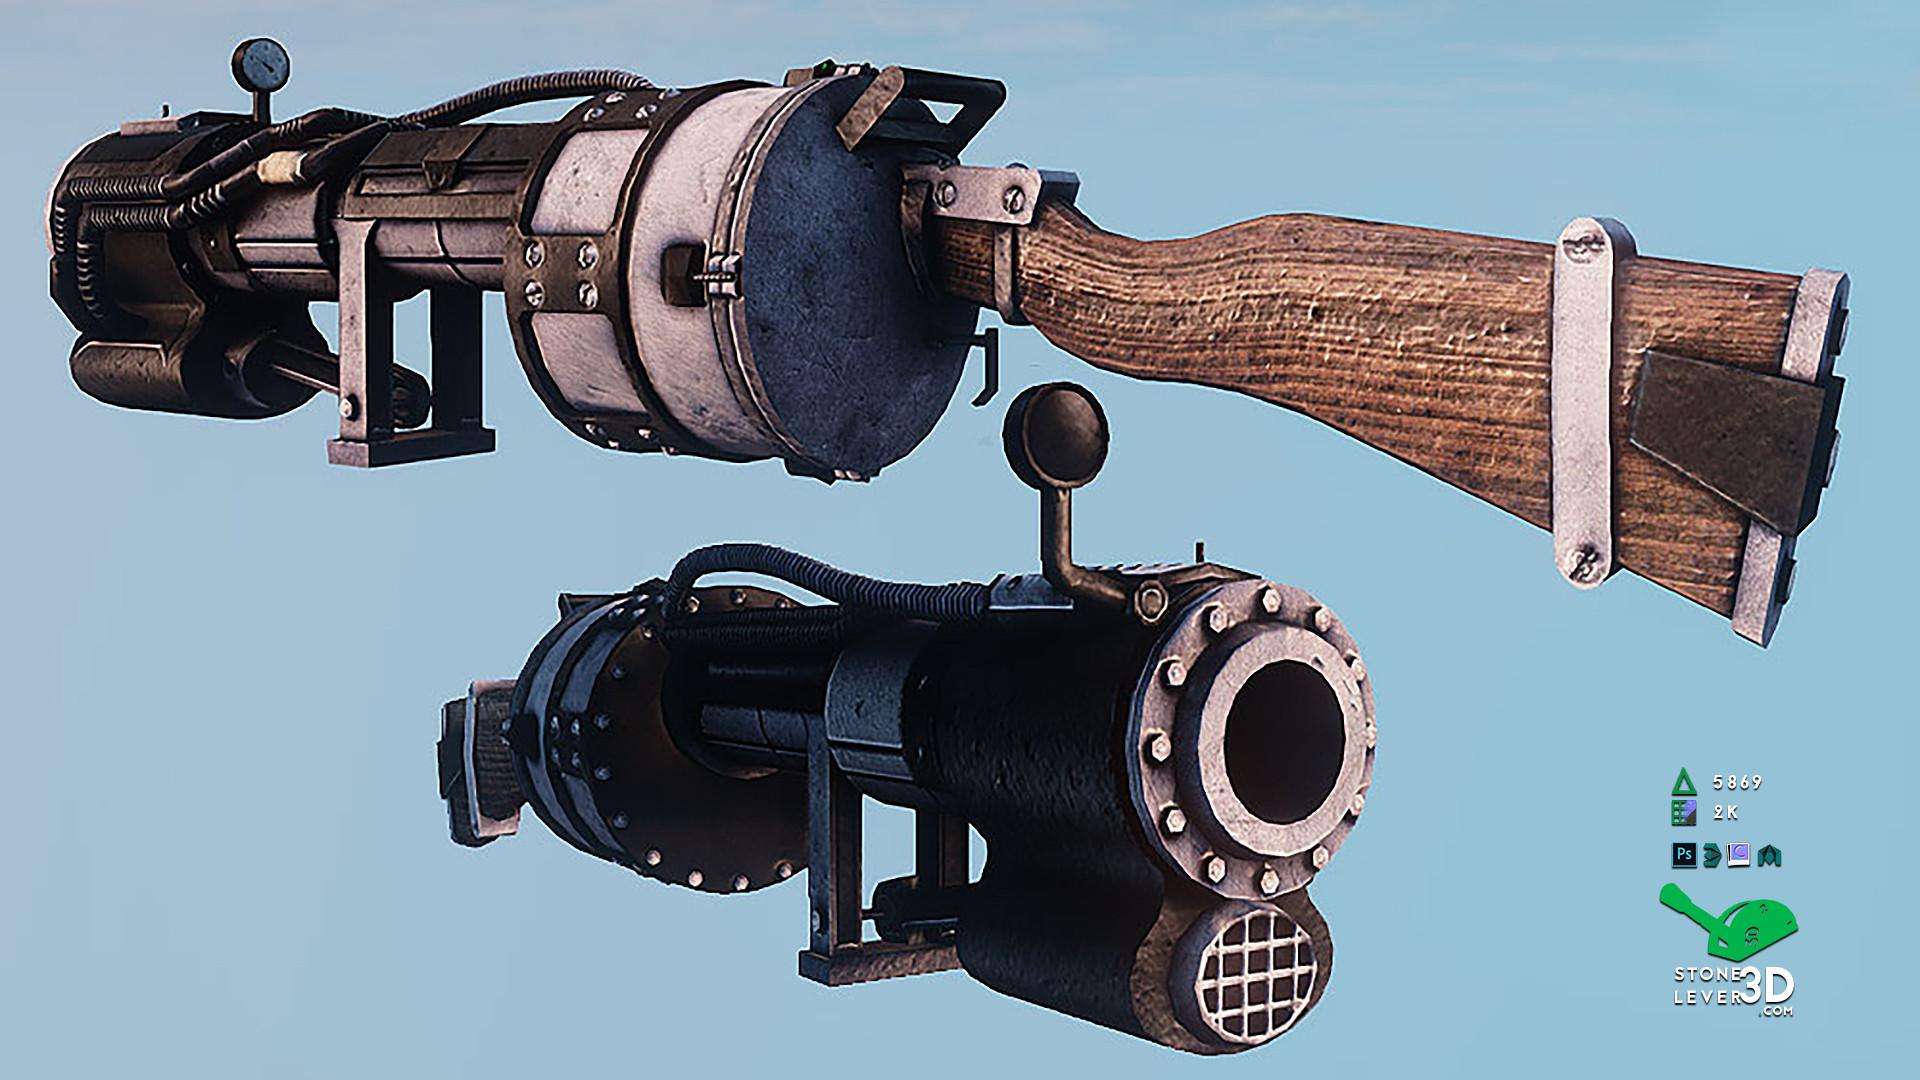 """Railway Rifle"" Weapon Prop Model Replica - UE4"